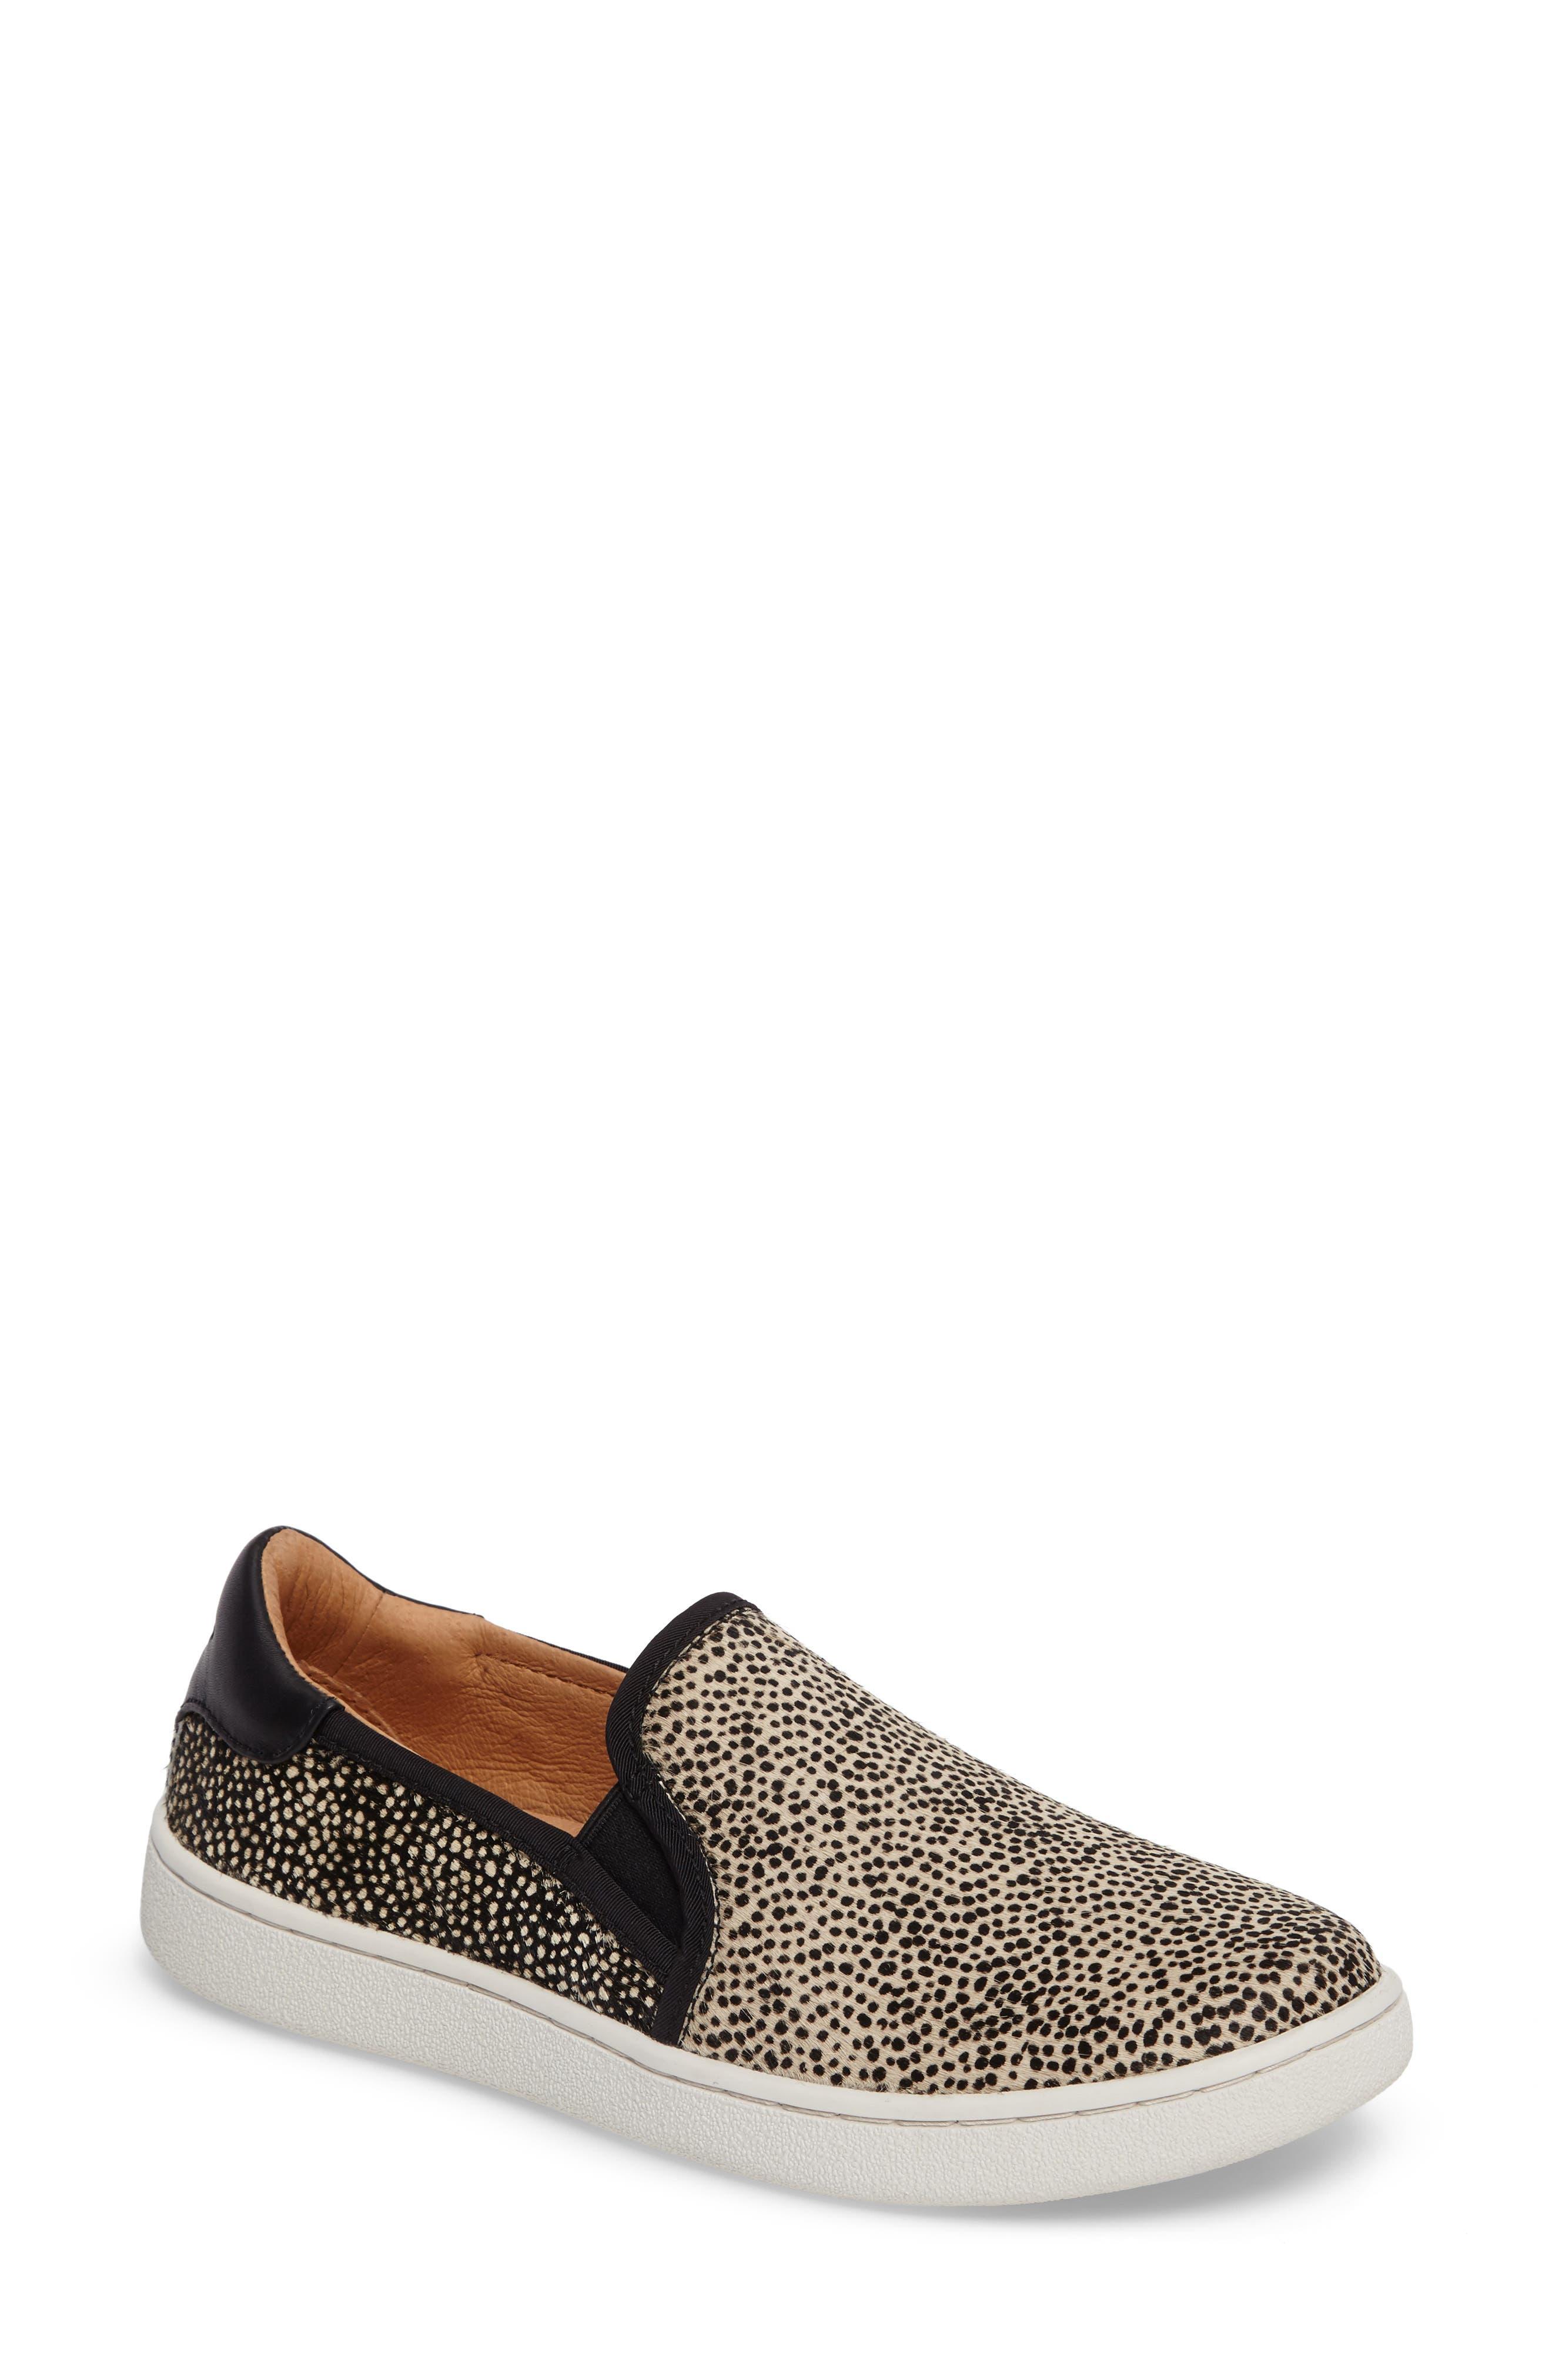 Main Image - UGG® Cas Exotic Genuine Calf Hair Slip-On Sneaker (Women)